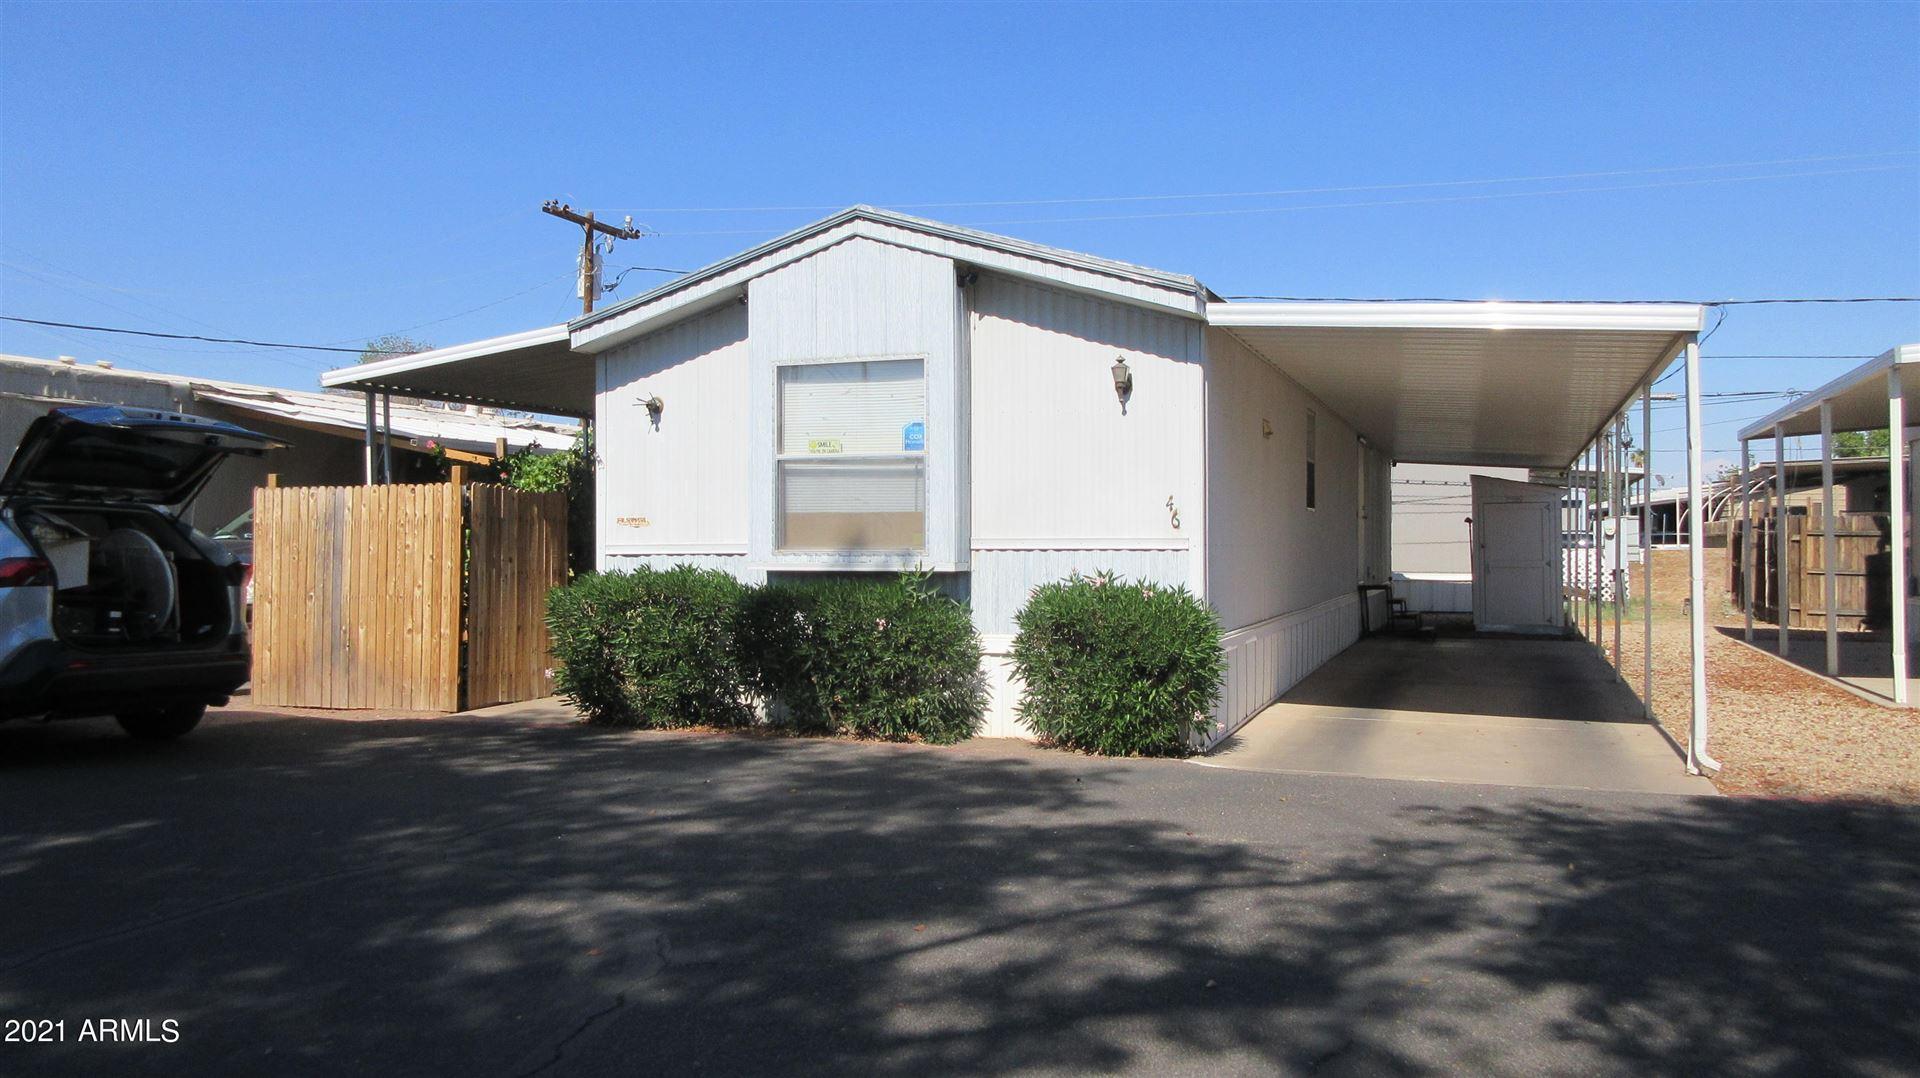 5002 W Bethany Home Road #46, Glendale, AZ 85301 - MLS#: 6245054